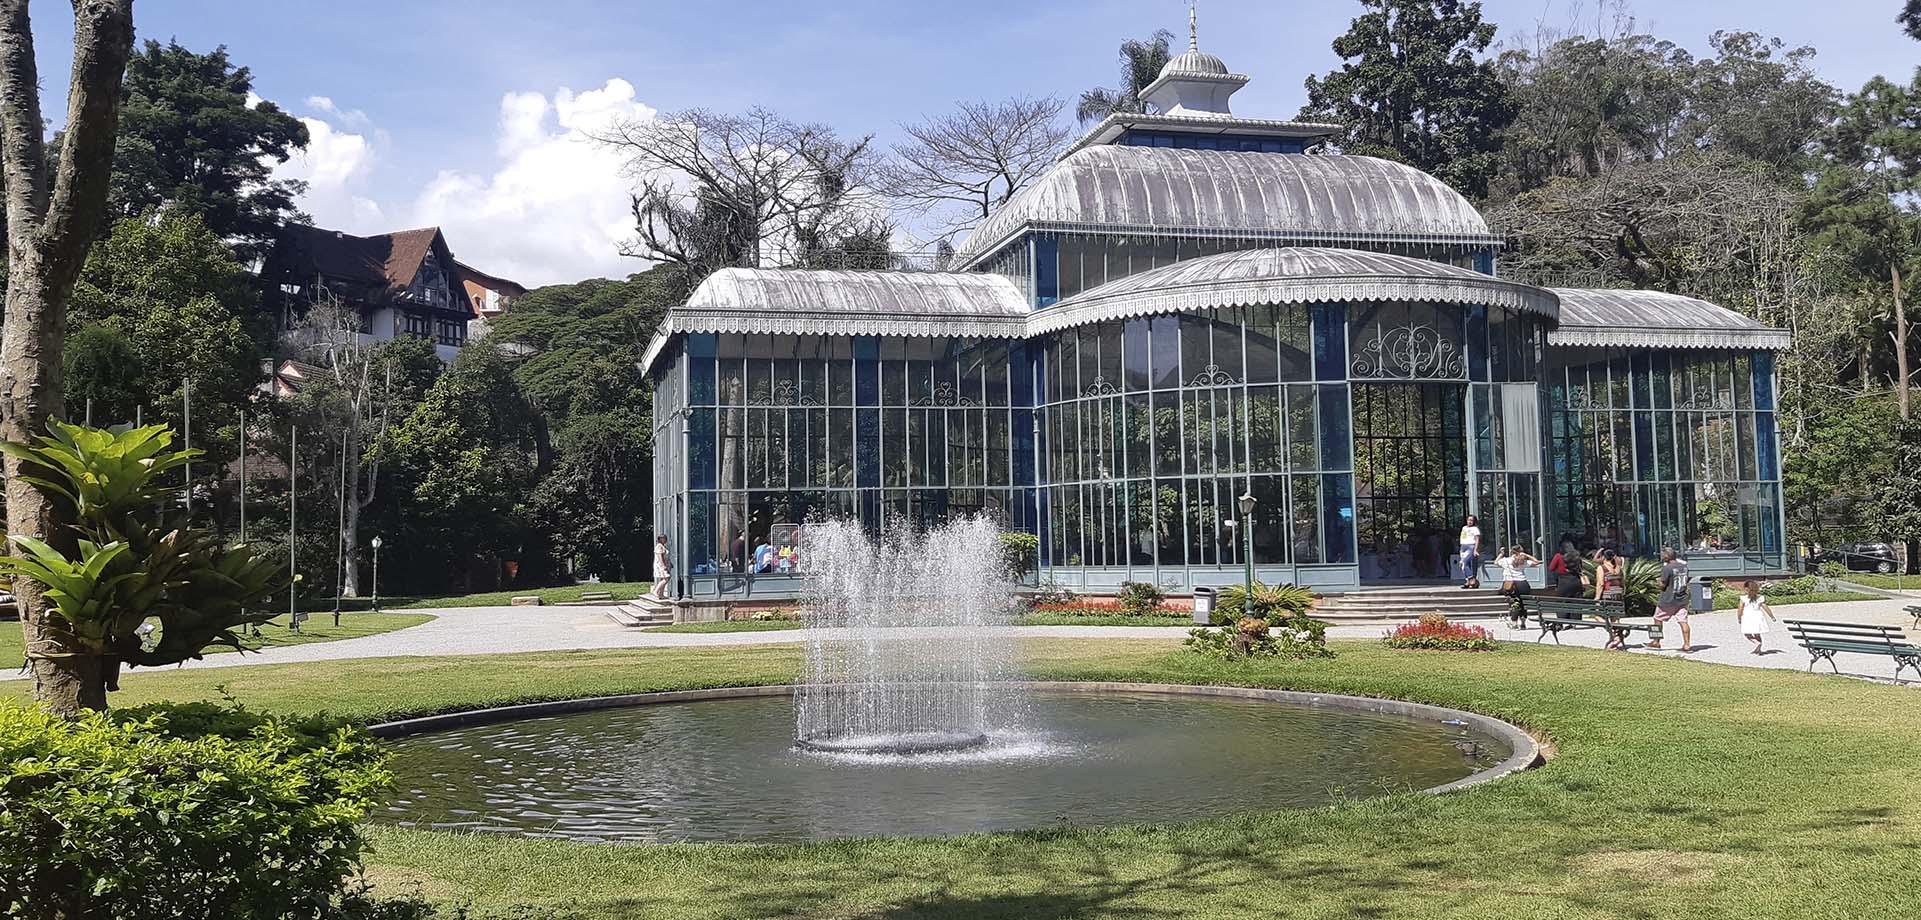 Visite à Petrópolis & Teresópolis